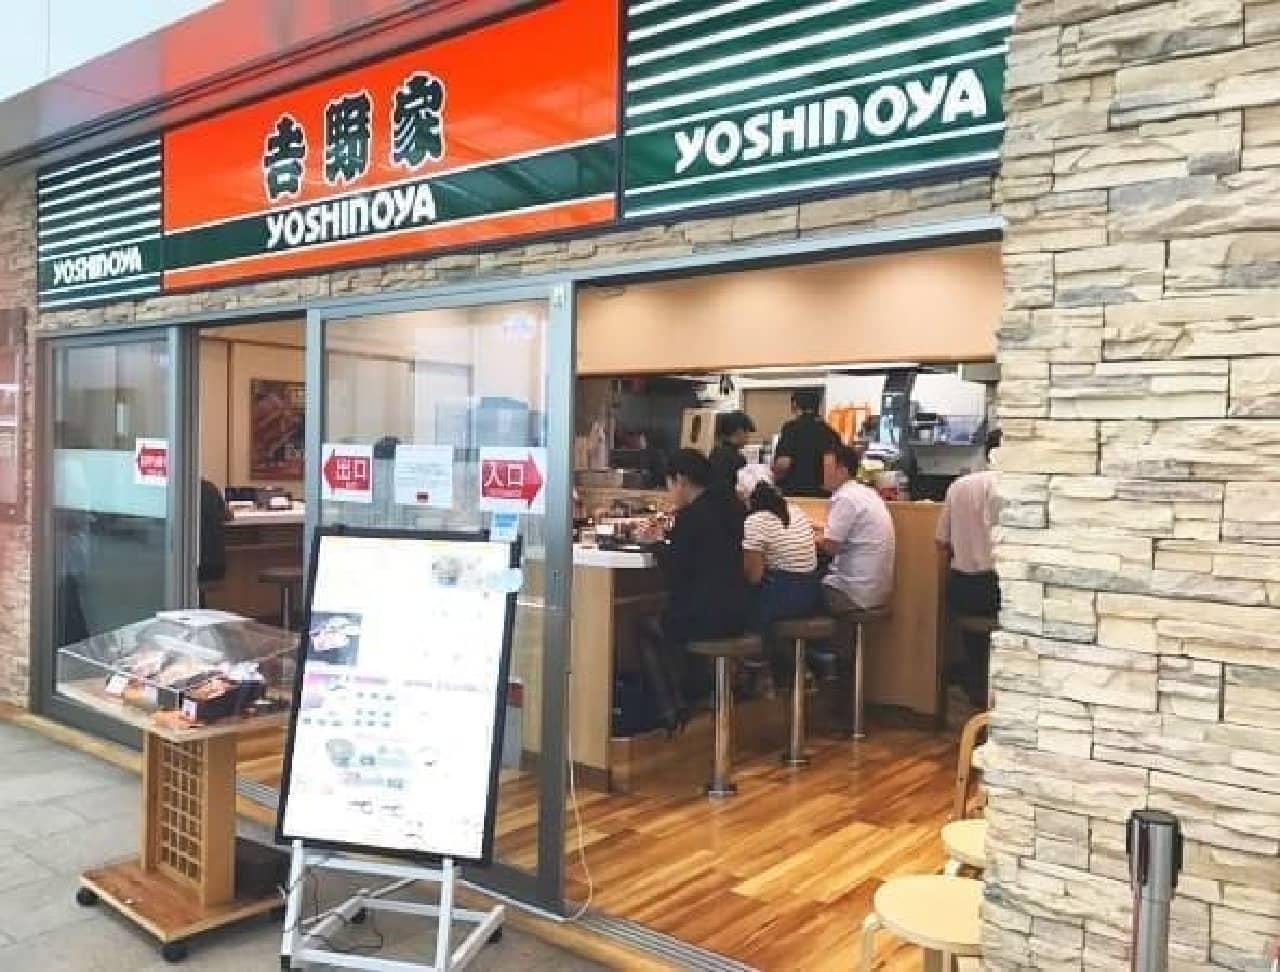 吉野家羽田空港国際線旅客ターミナル店